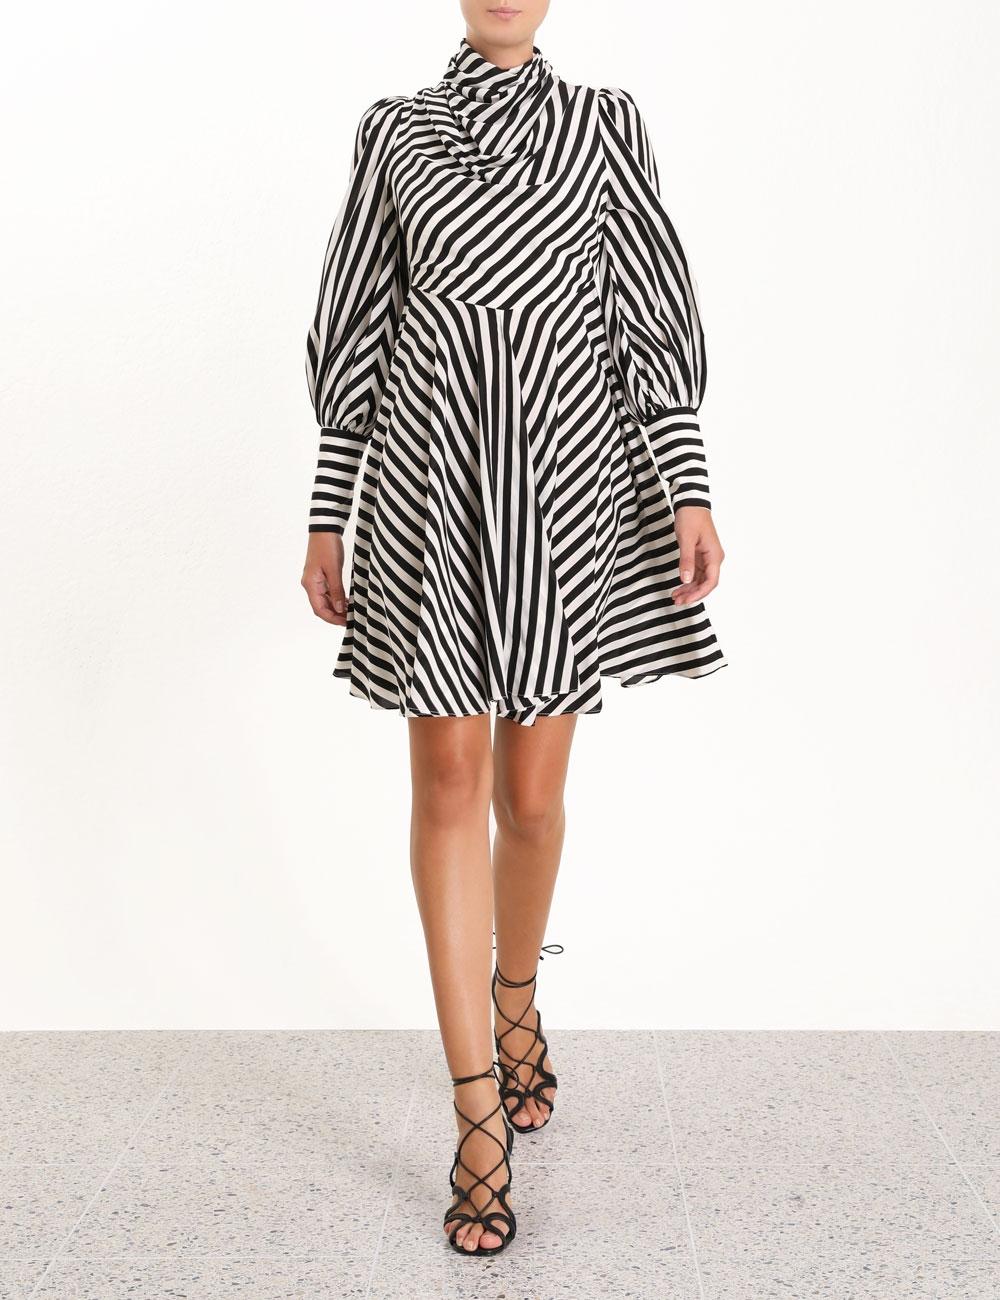 Zippy Cowl Short Dress